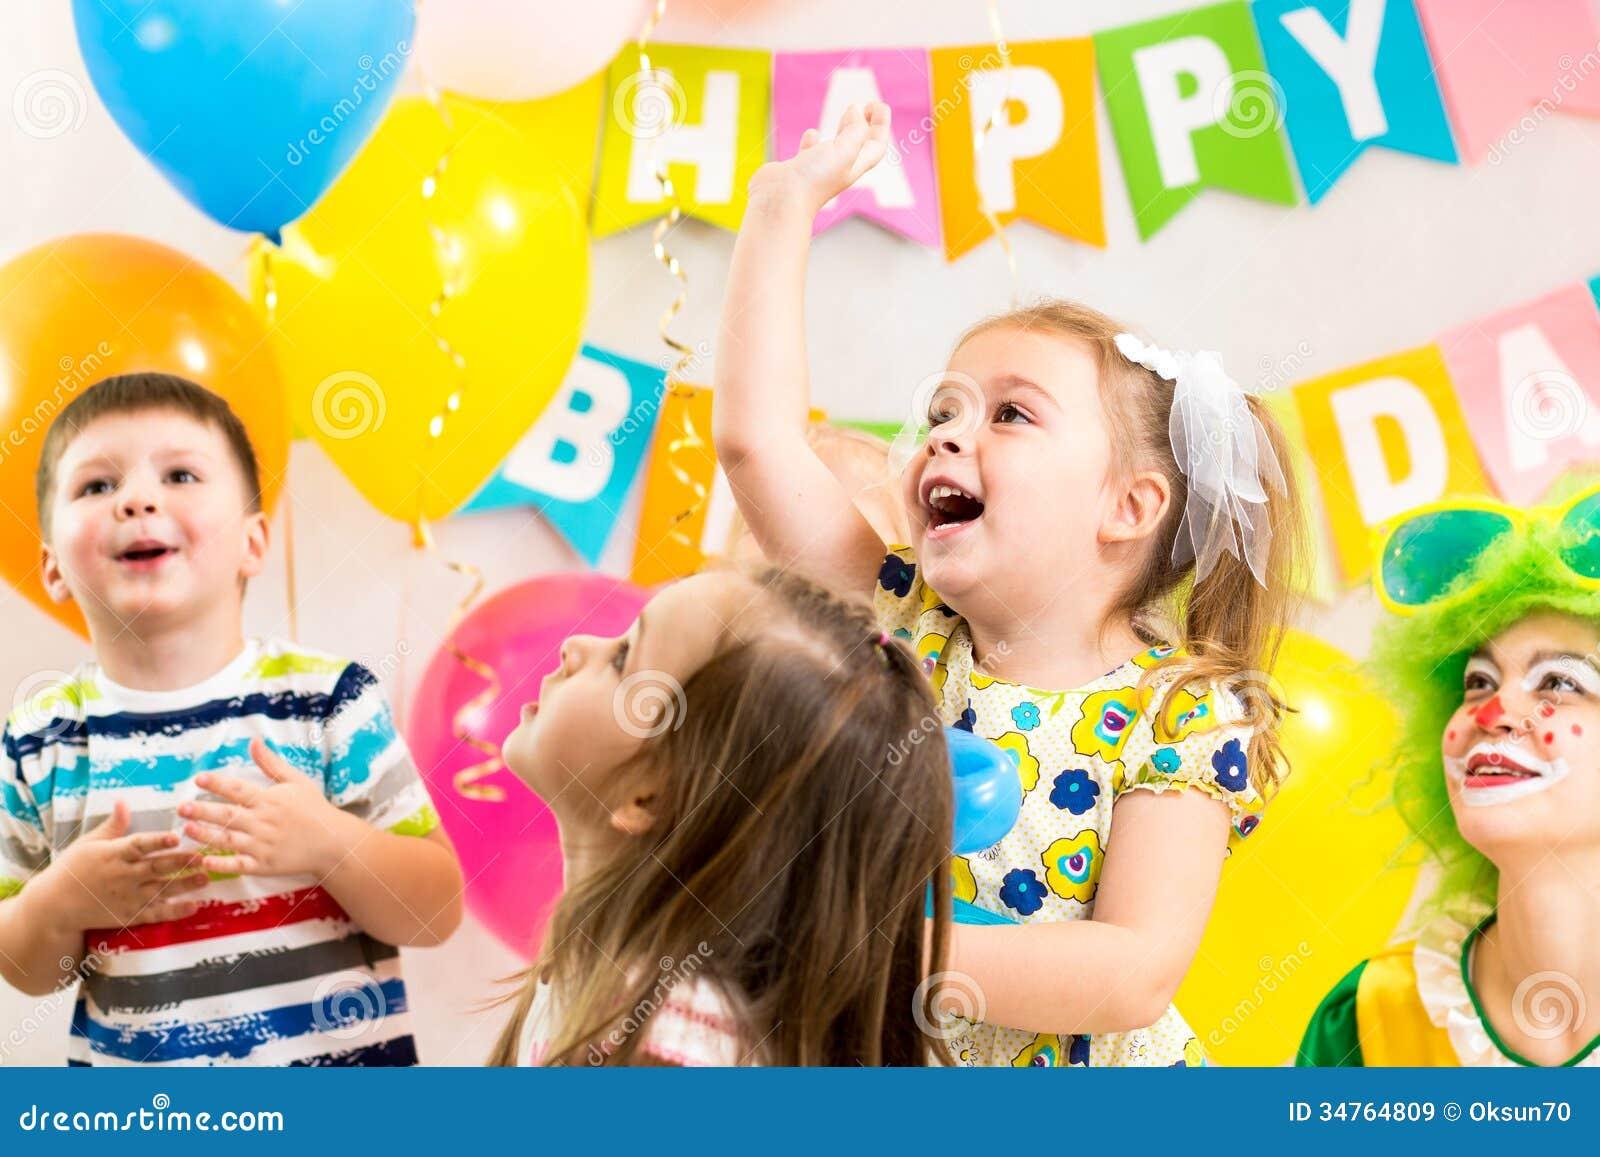 Jolly kids group celebrating birthday party